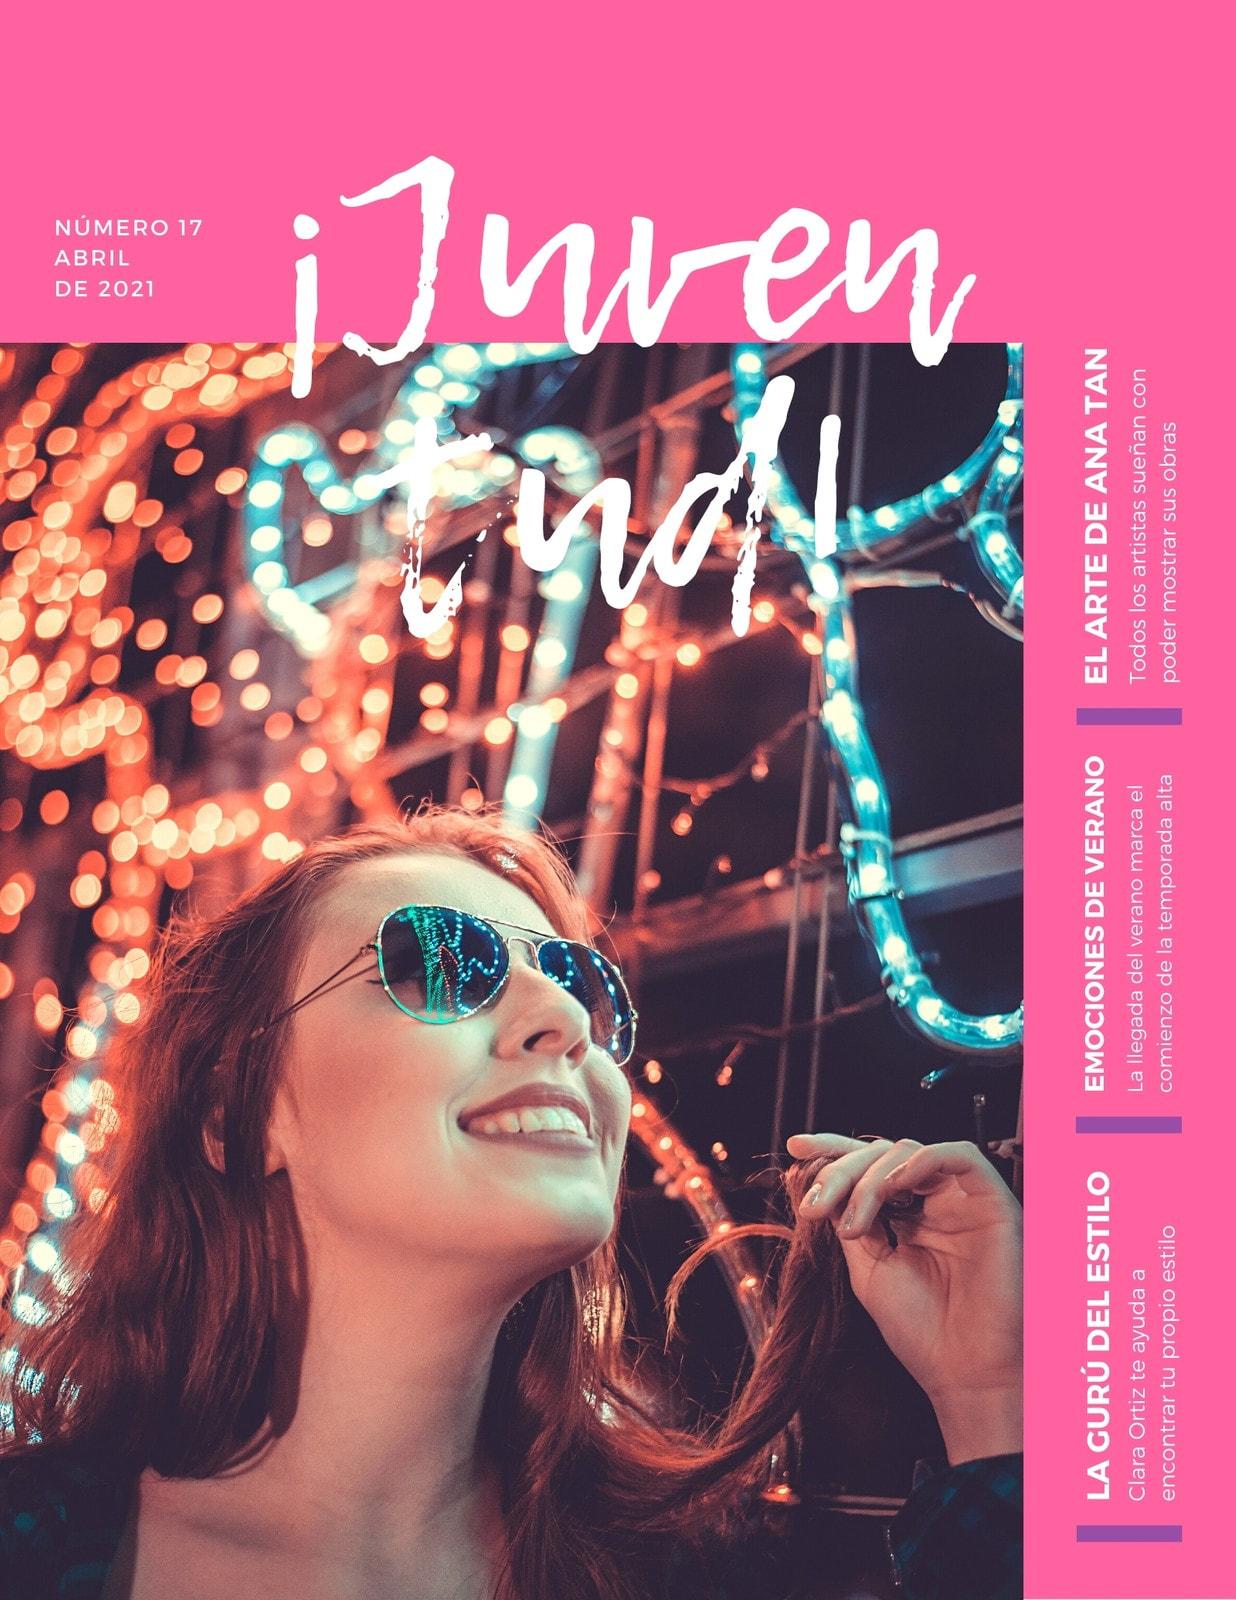 Rosa Femenino Adolescente Revista Portada